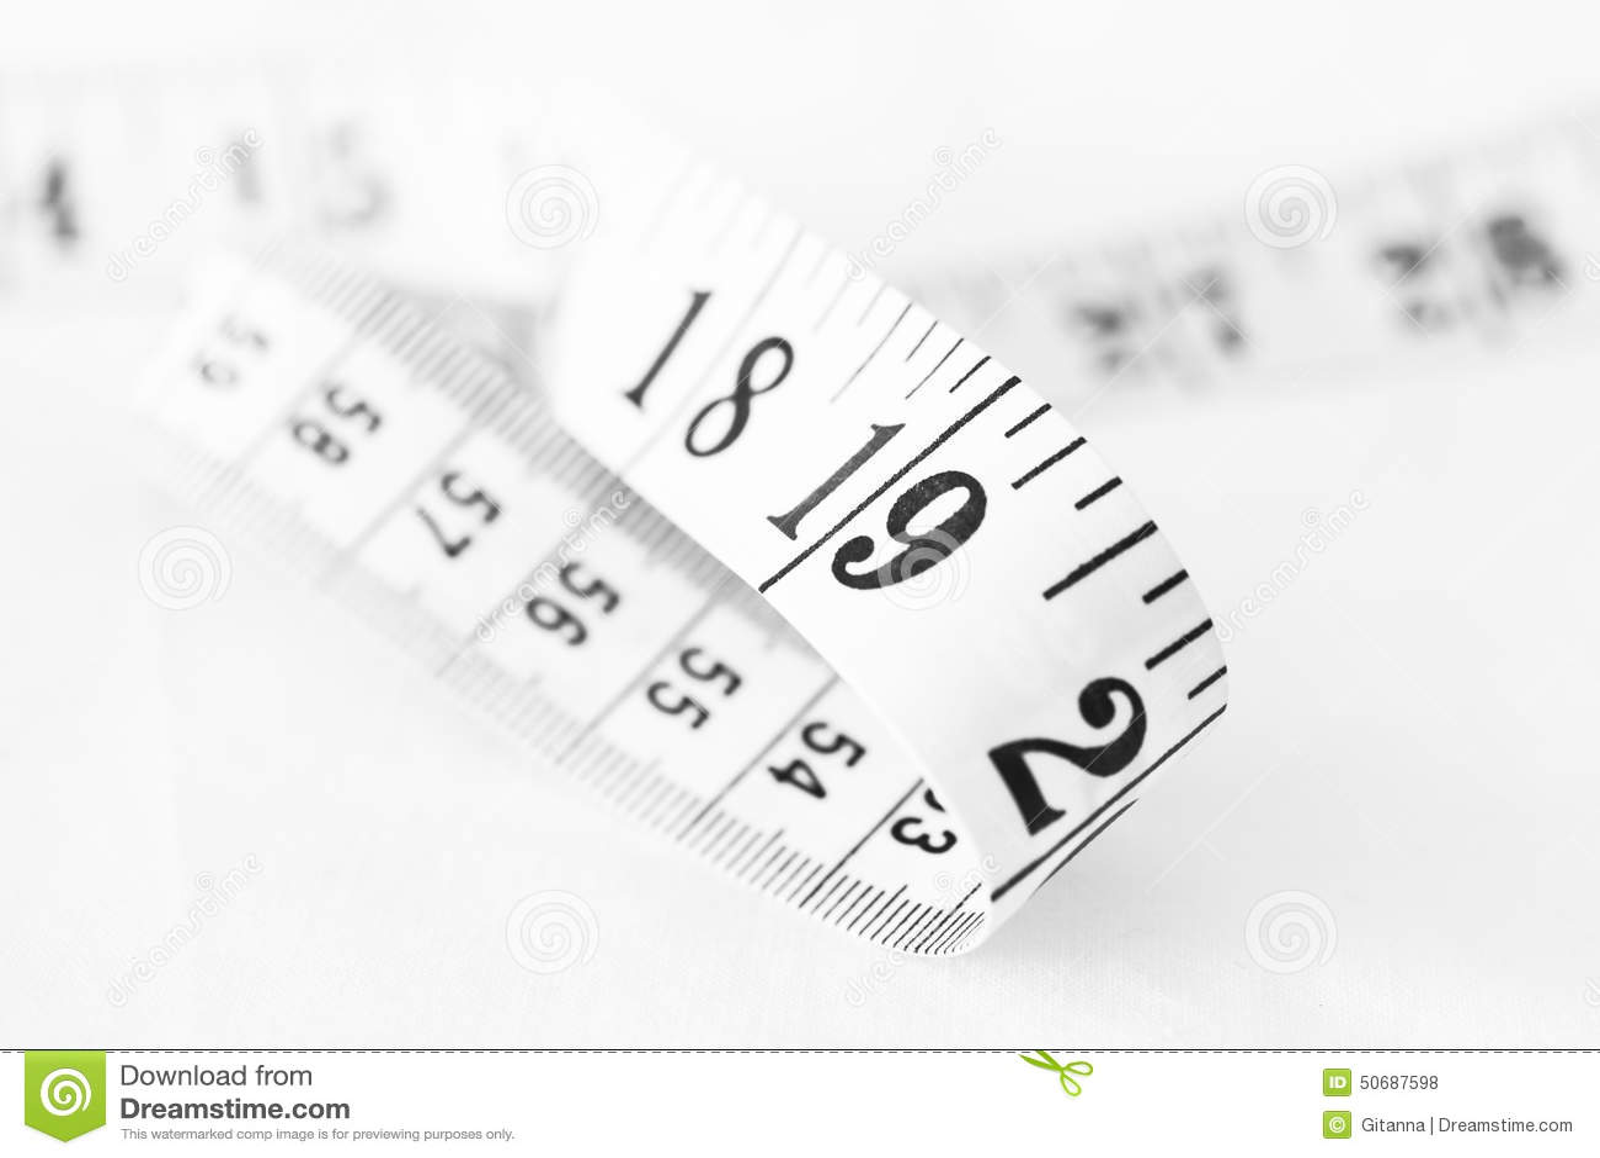 Download 评定的磁带 库存照片. 图片 包括有 螺旋, 距离, 剪切, 线路, 维数, 统治者, 英寸, 研究, 超重 - 50687598